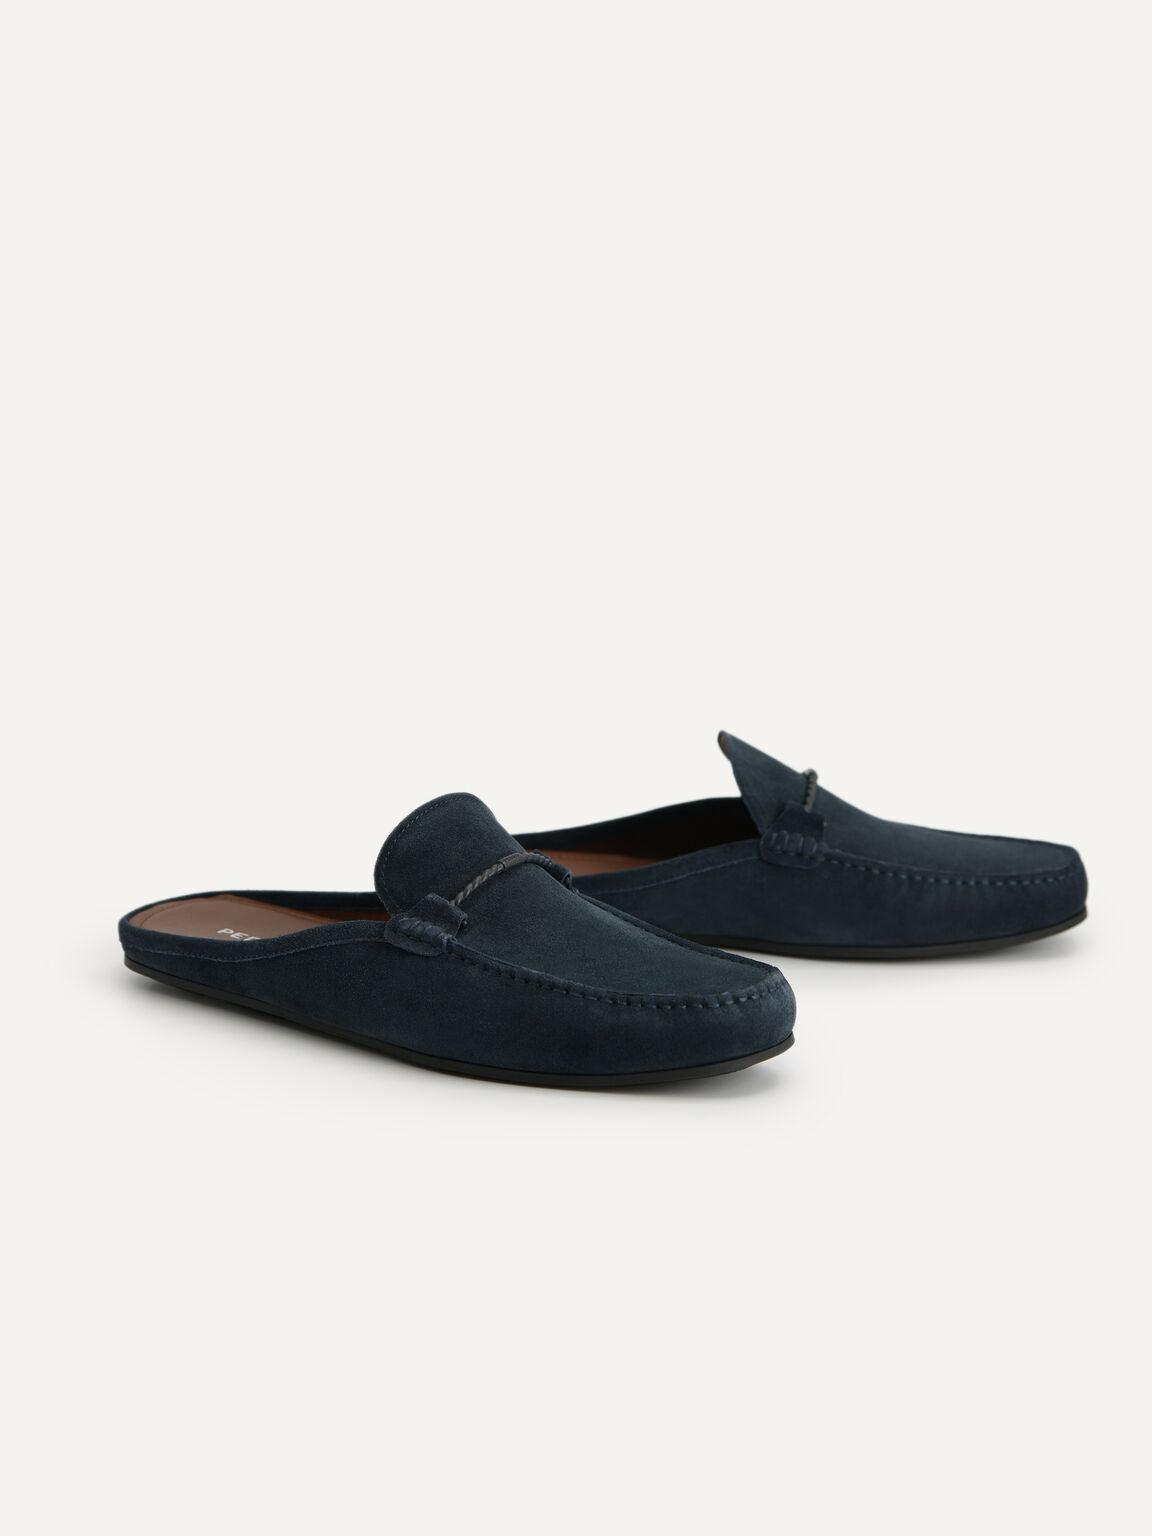 Suede Slip-On Loafers, Navy, hi-res